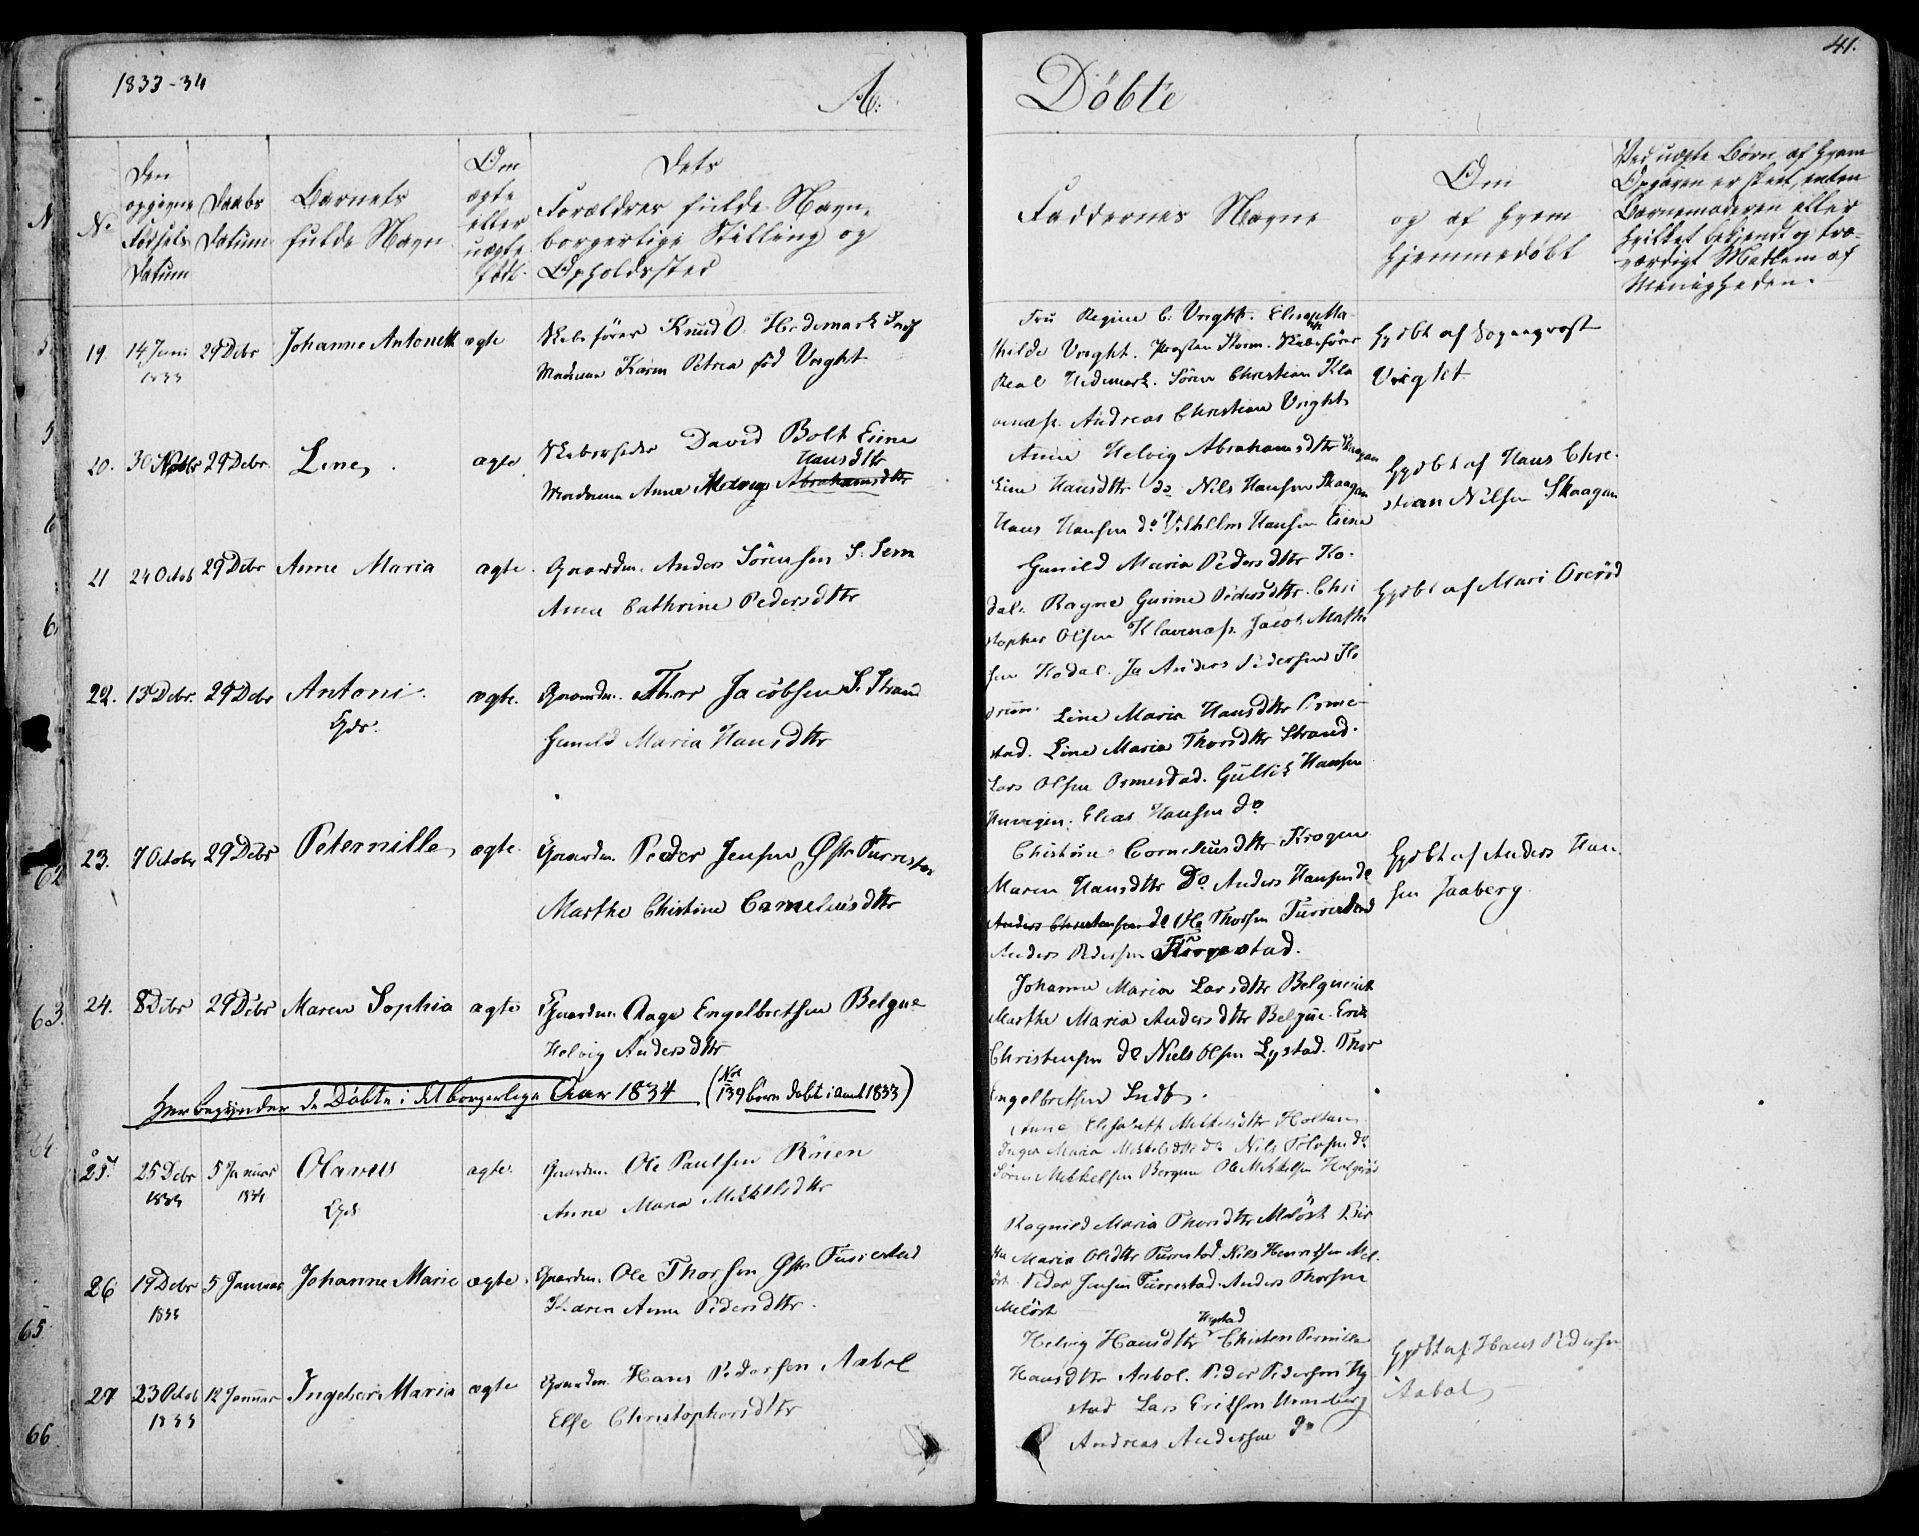 SAKO, Sandar kirkebøker, F/Fa/L0005: Parish register (official) no. 5, 1832-1847, p. 40-41